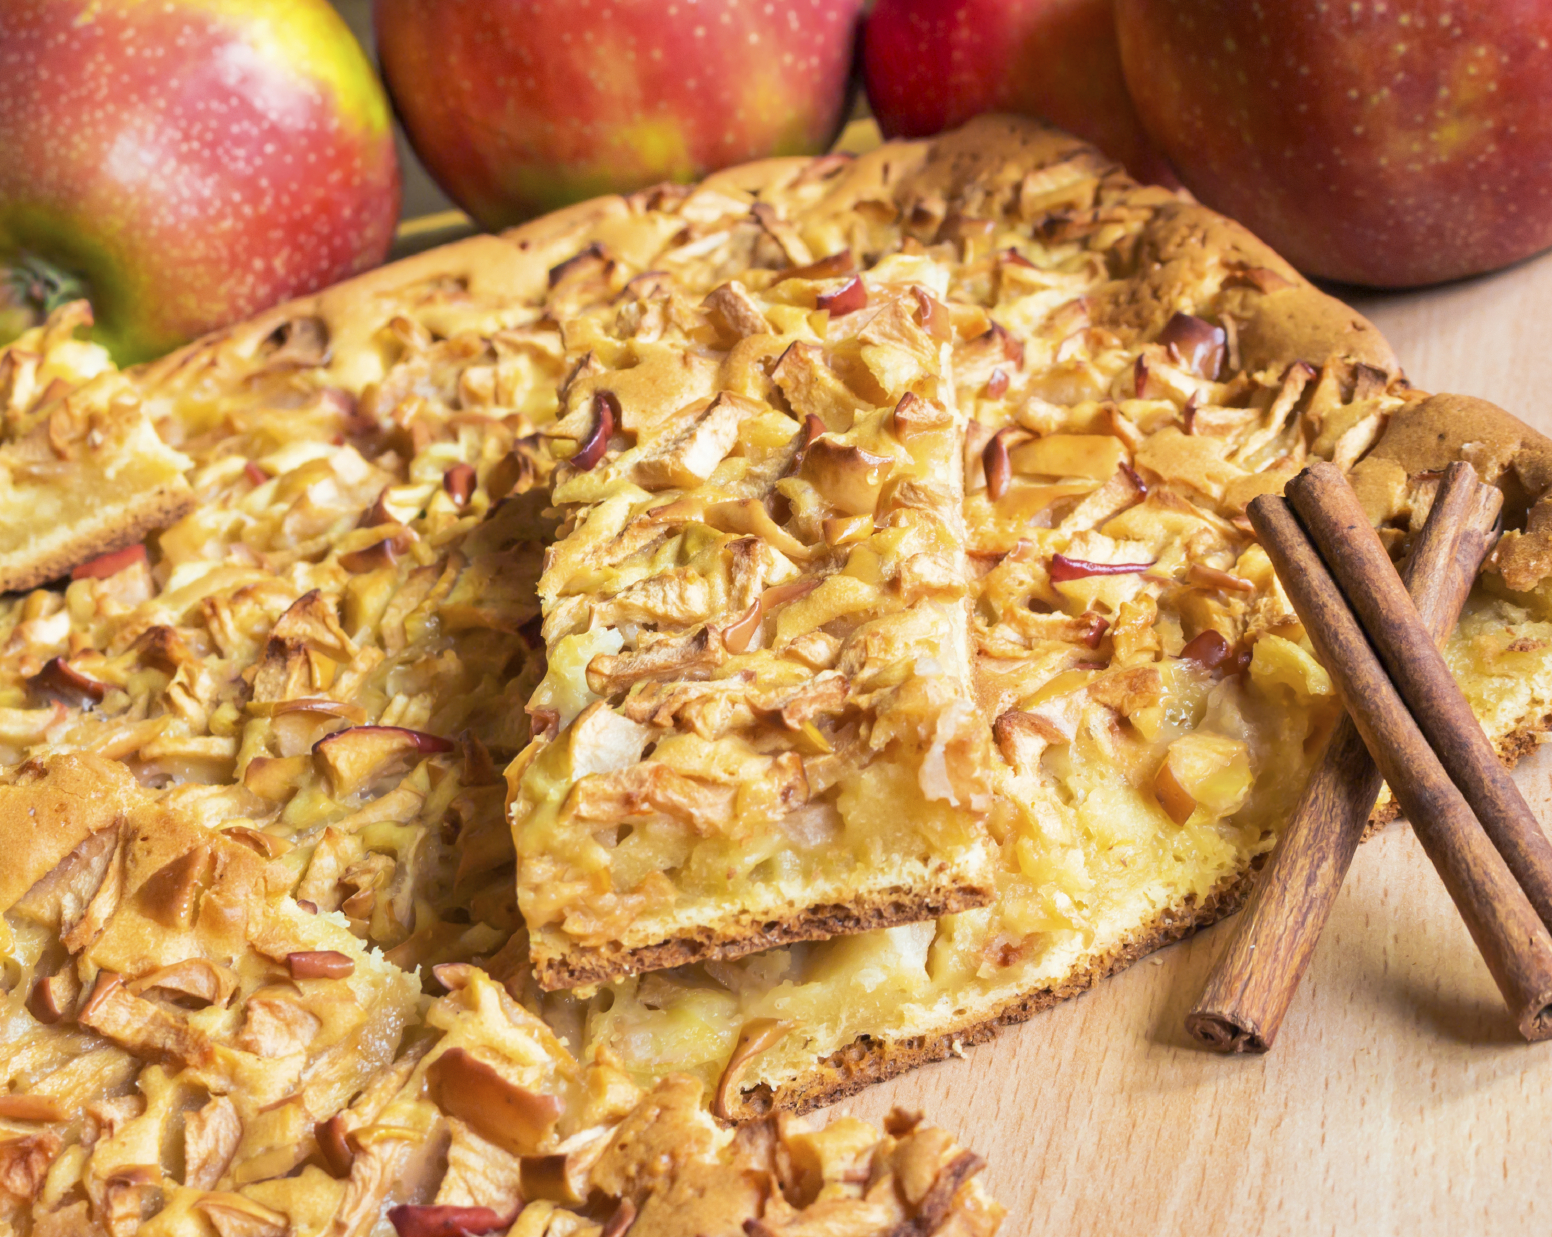 Recipe: Homemade apple and cinnamon cake